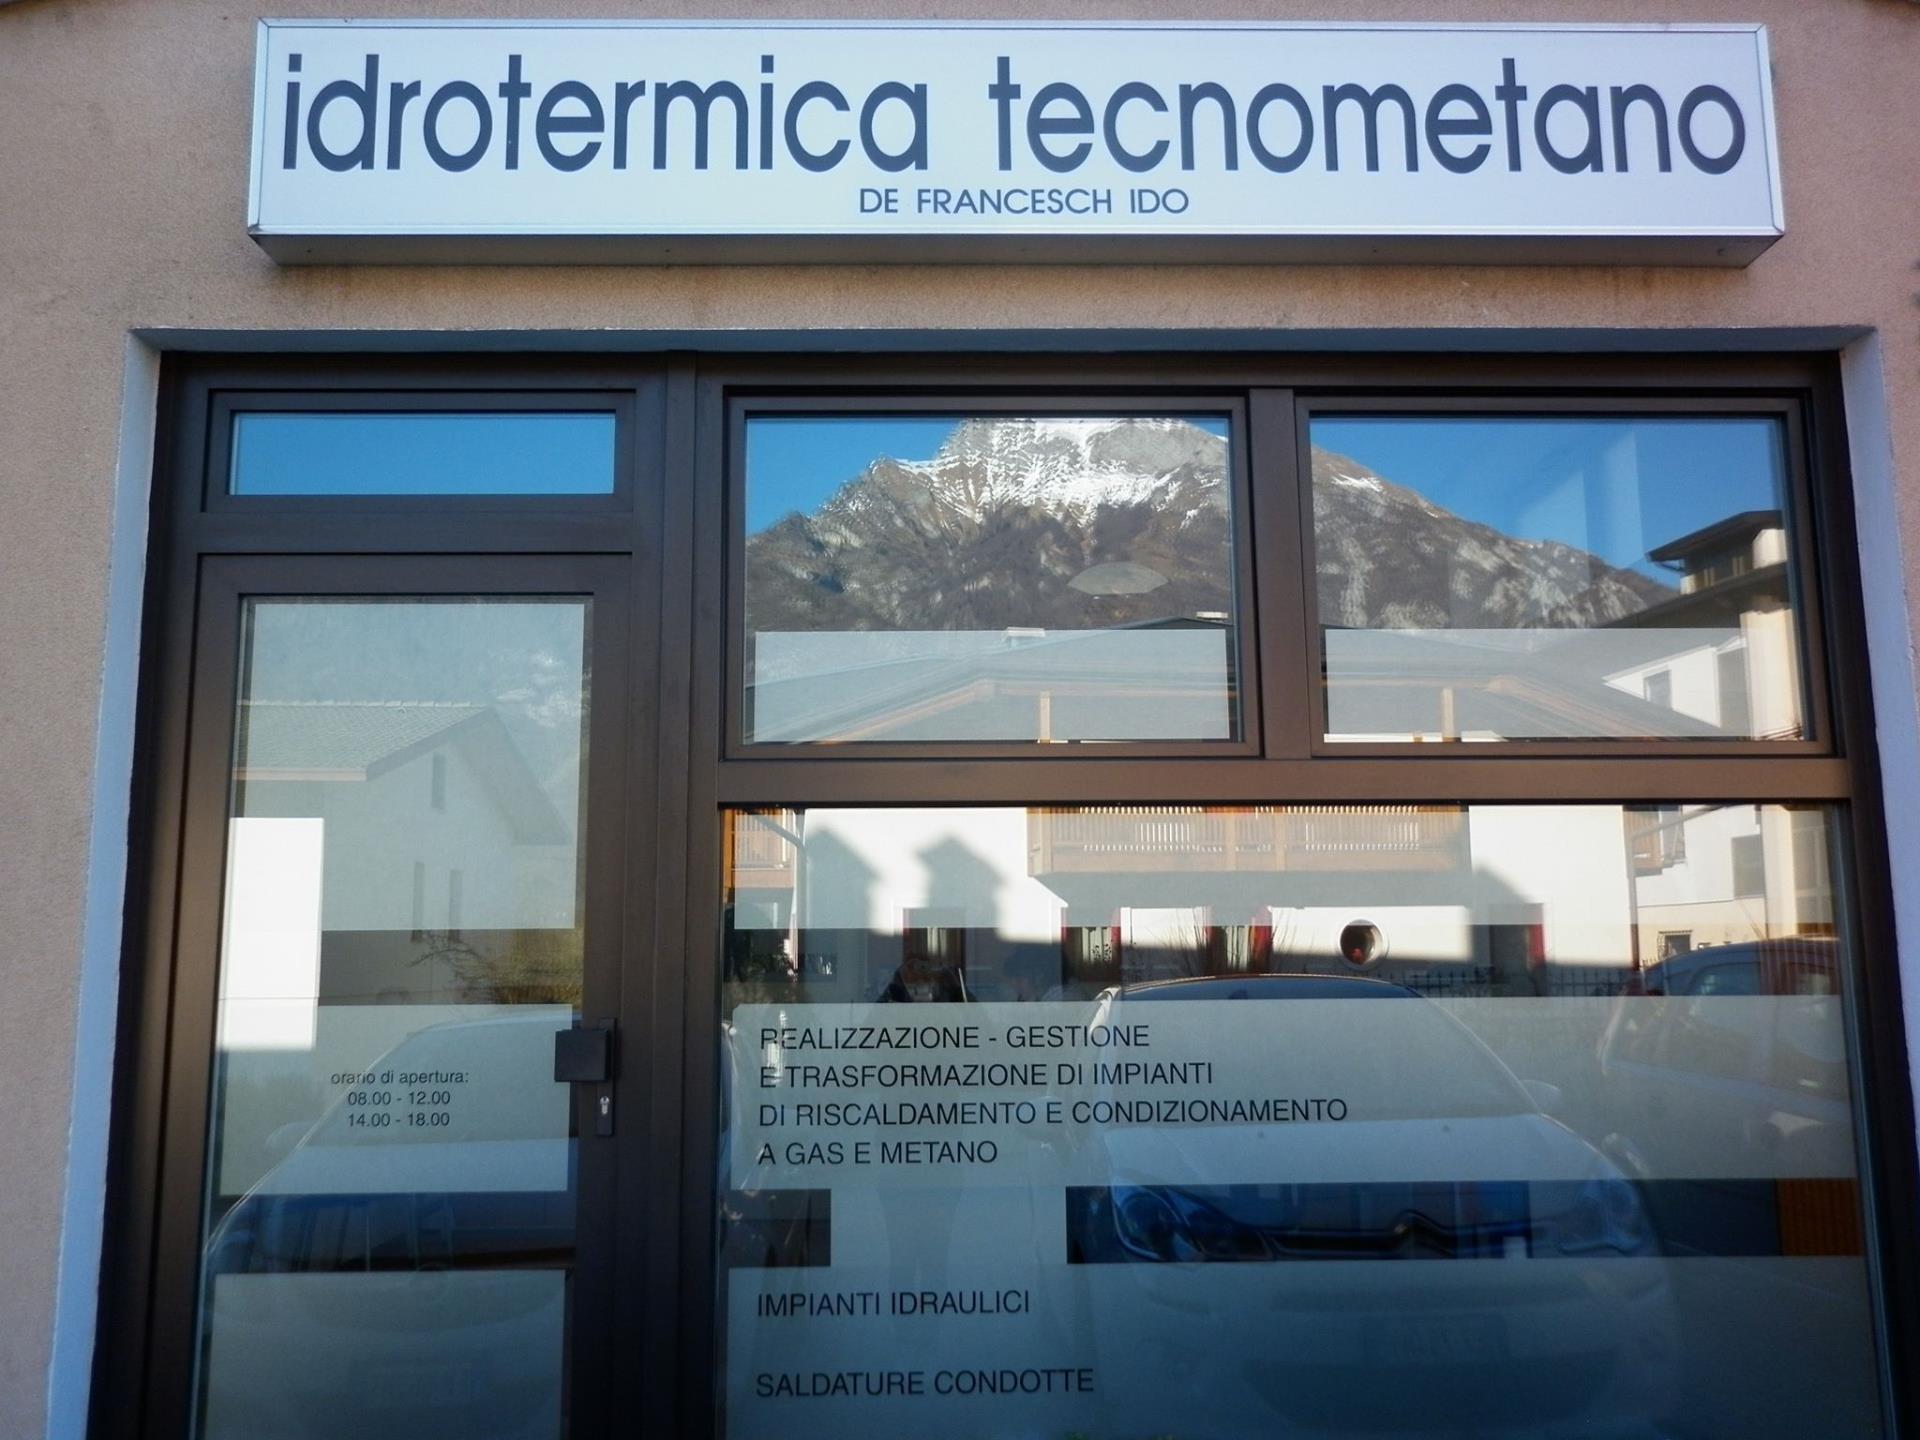 Idrotermica Tecnometano di De Francesch Ido sede operativa